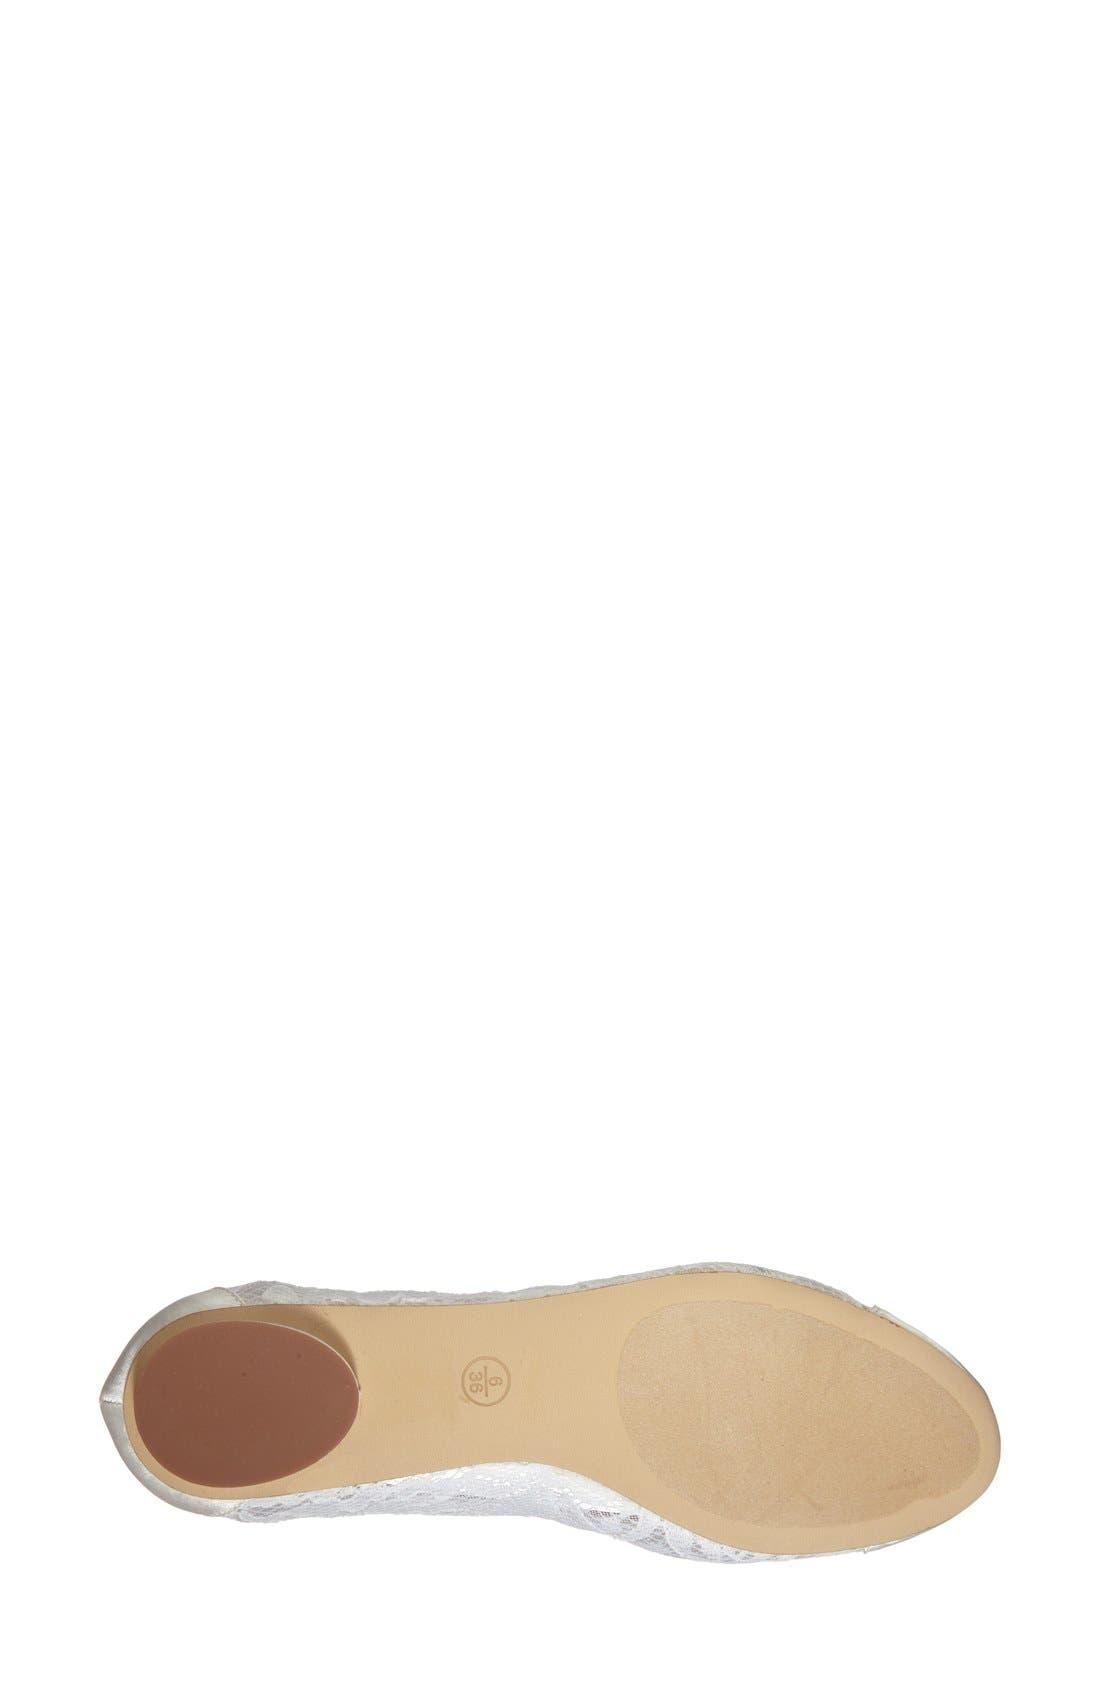 'Sweetie' Lace Cap Toe Ballet Flat,                             Alternate thumbnail 4, color,                             Ivory Lace/ Mesh